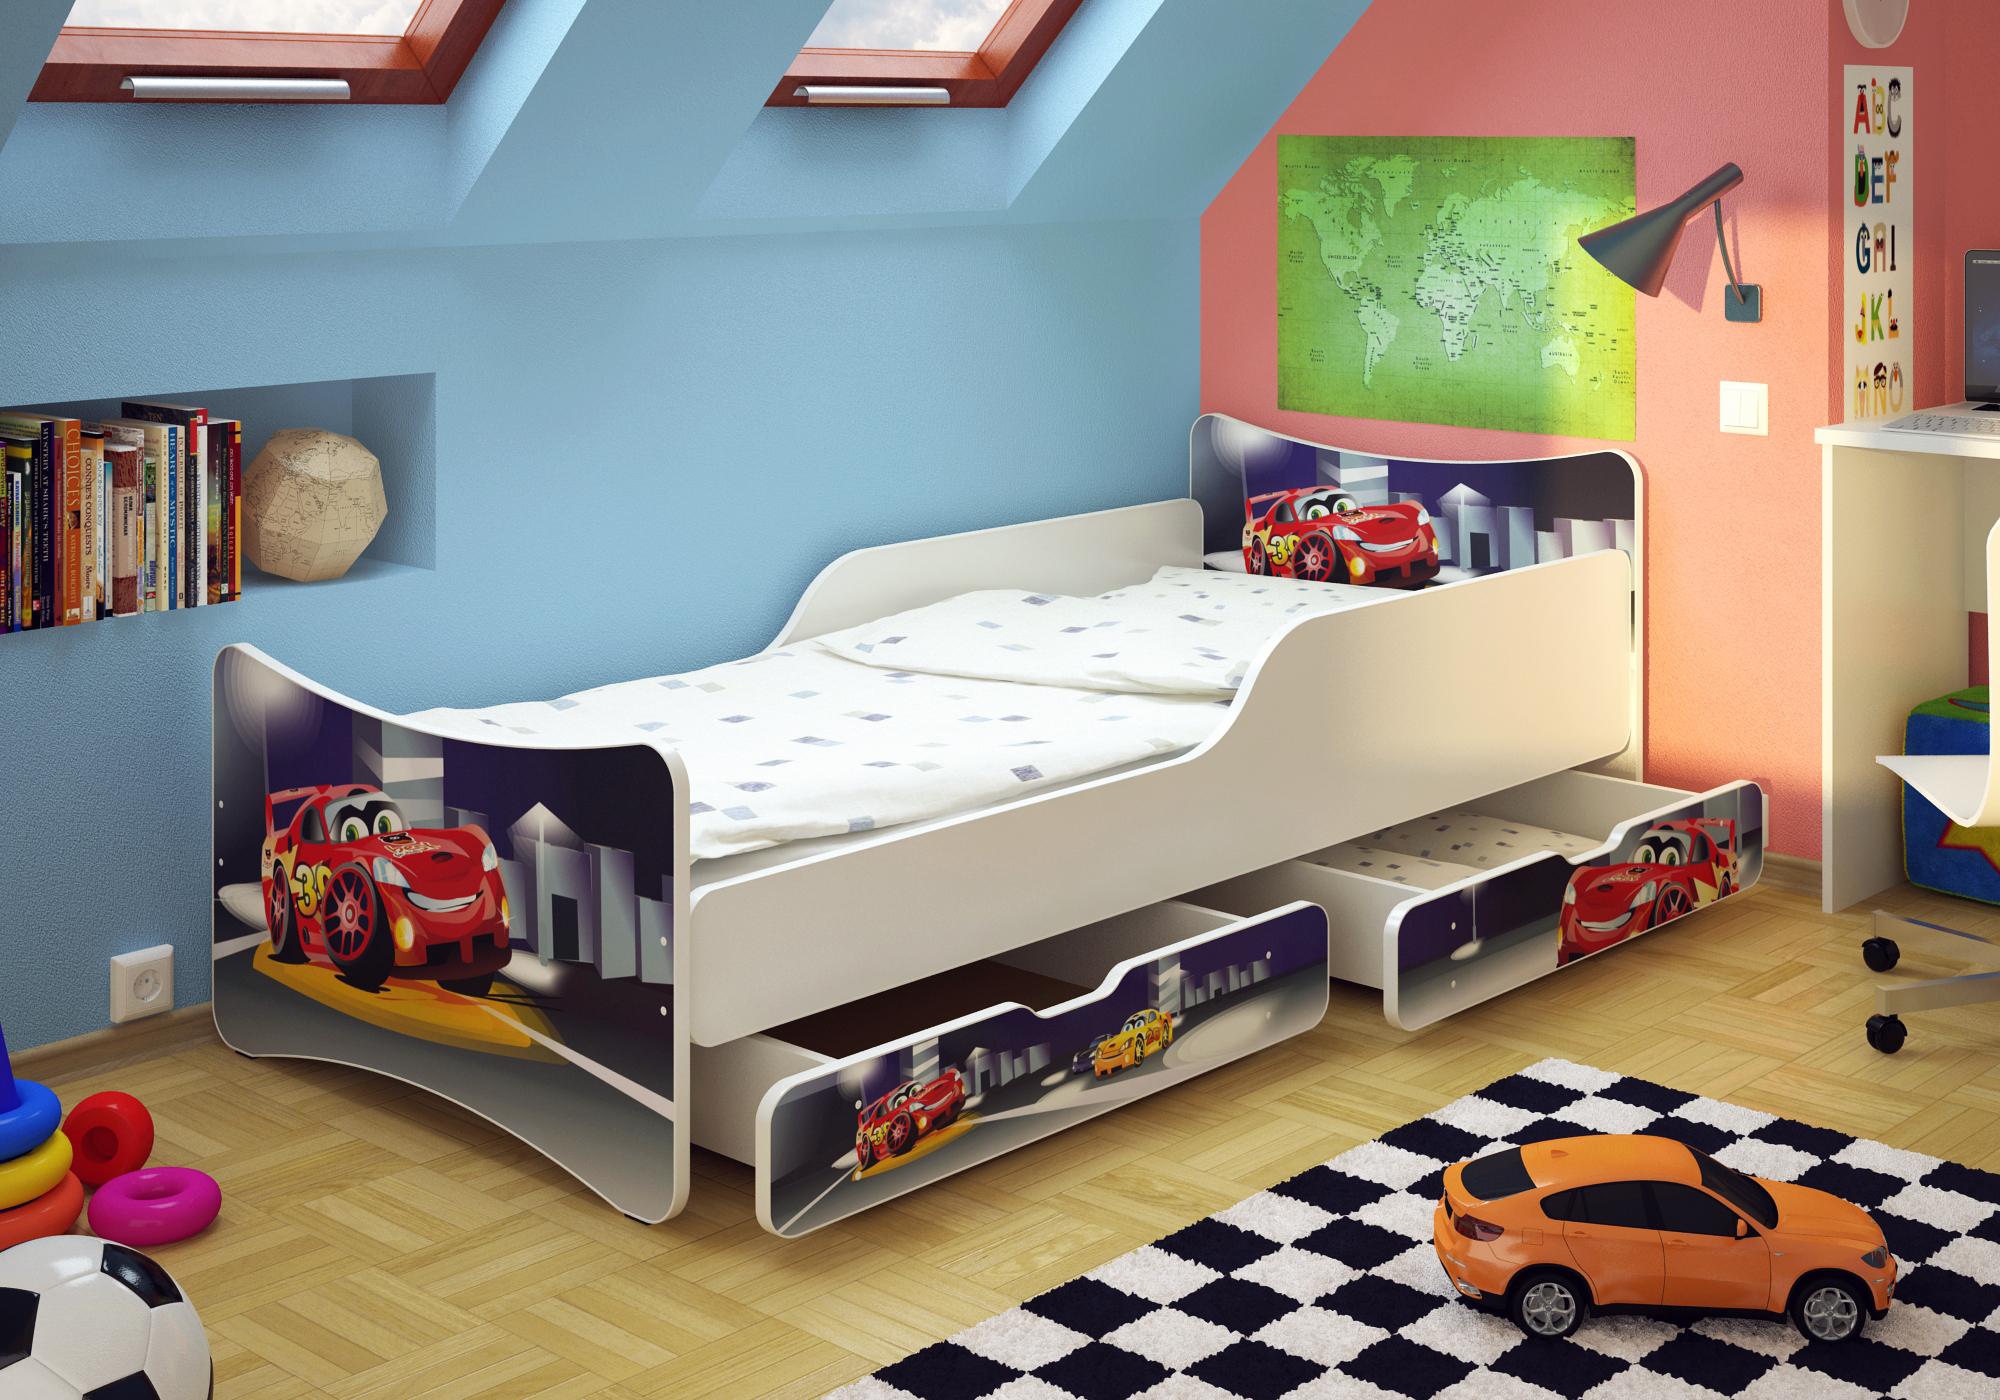 bfk car babybett kinderbett jugendbett 90x200 matratze. Black Bedroom Furniture Sets. Home Design Ideas